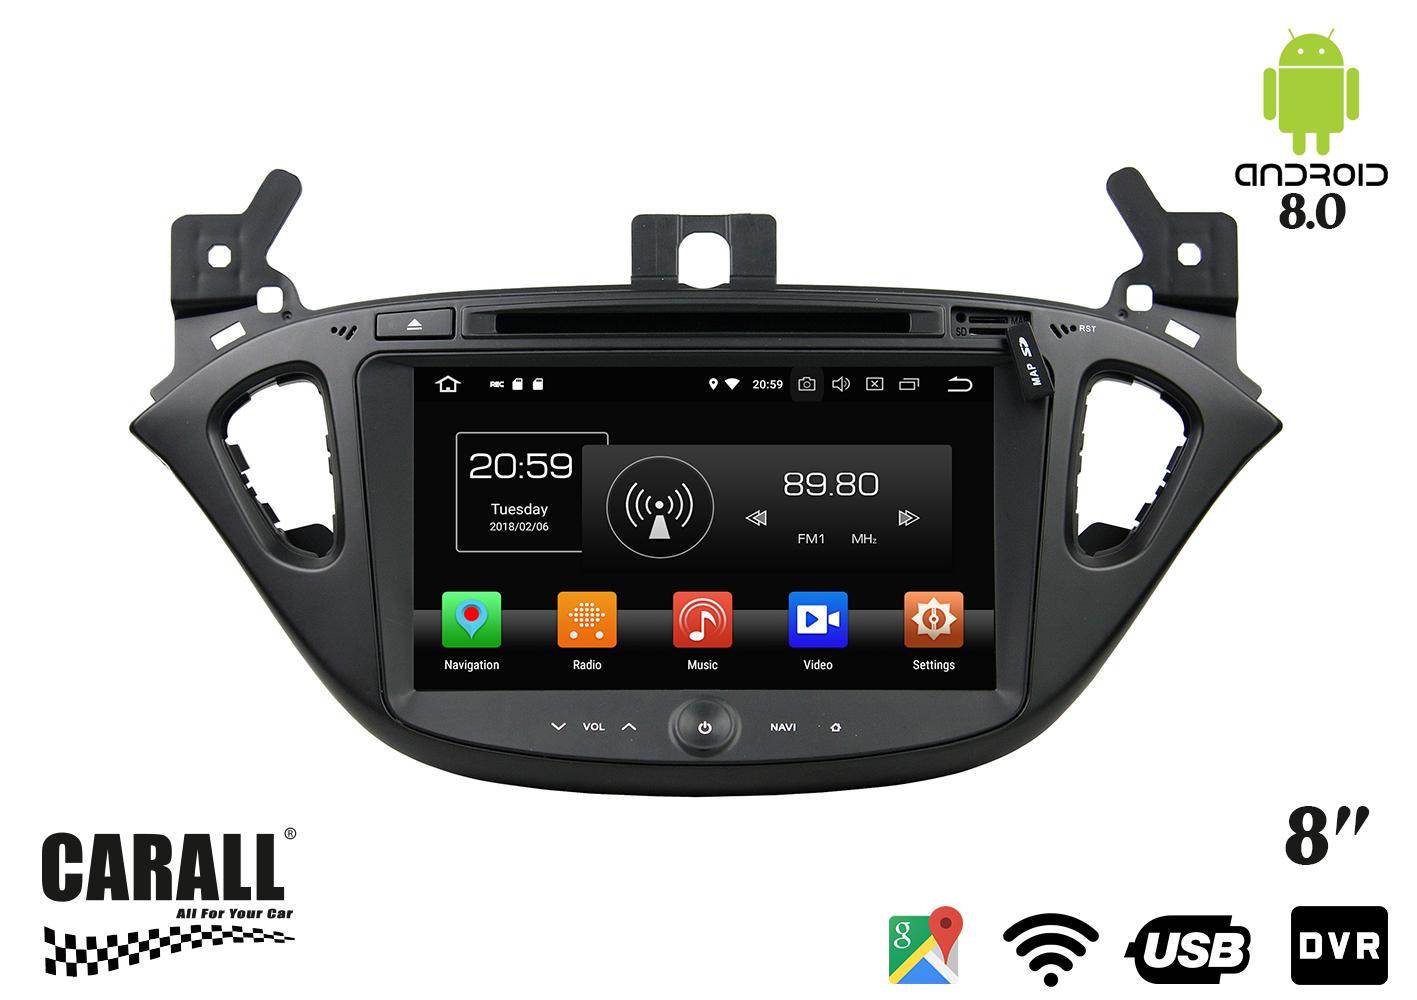 Autoradio Android 8,0 Opel Corsa GPS DVD USB SD WI-FI Bluetooth Navigatore - KIT